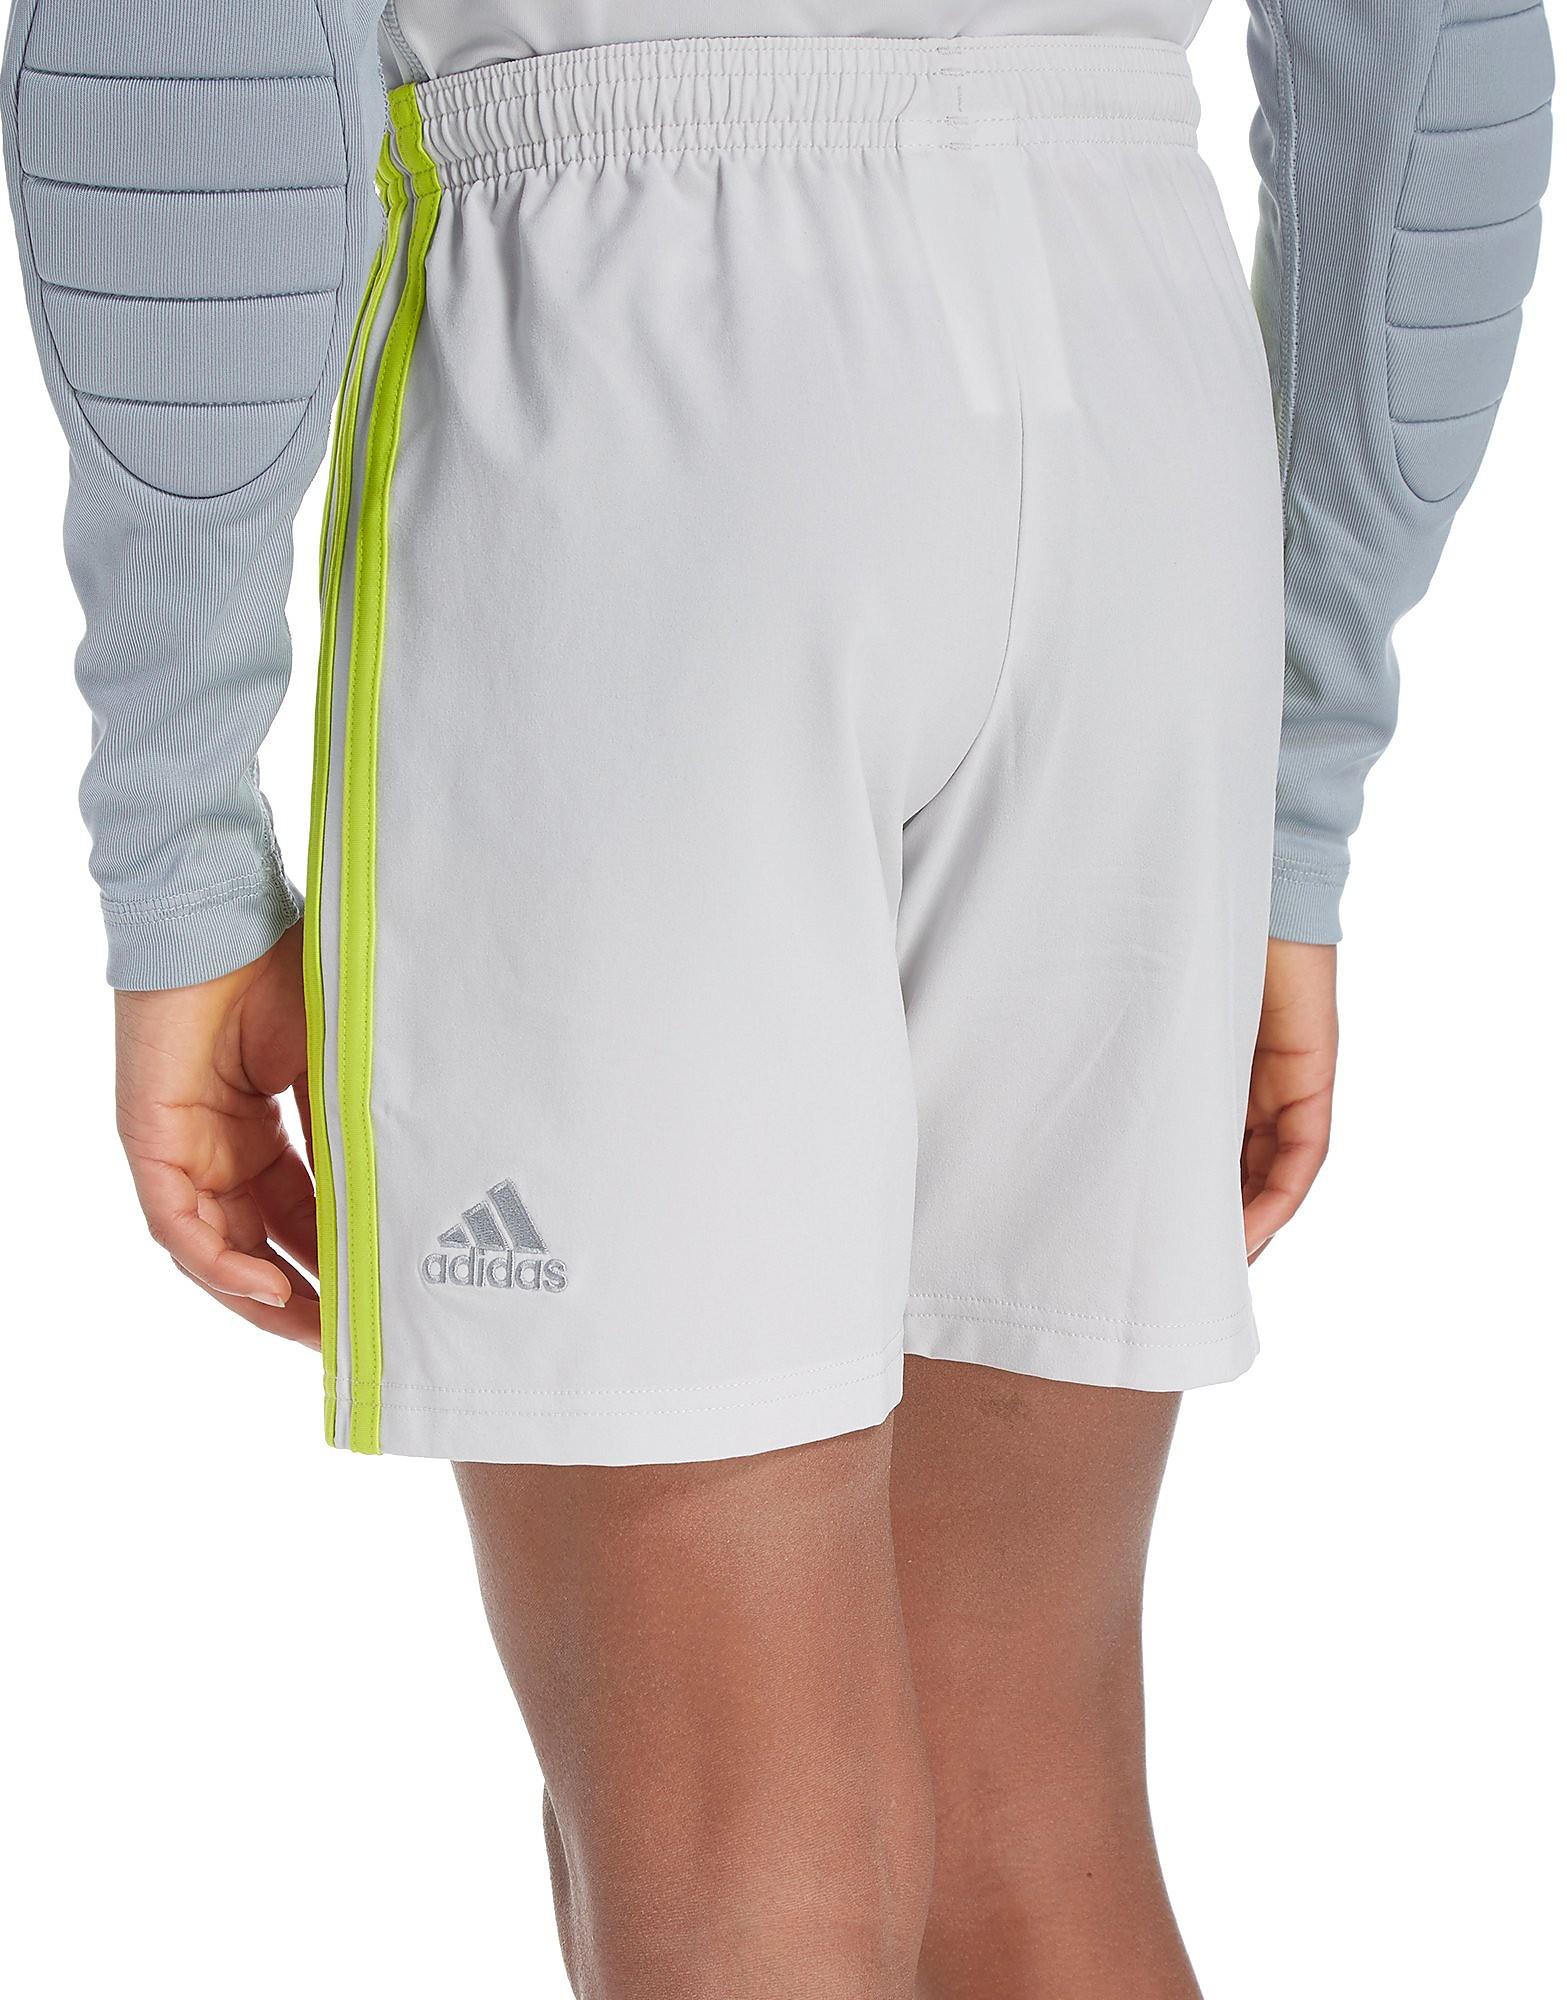 adidas Scotland 2018 Home Goalkeeper Shorts Junior